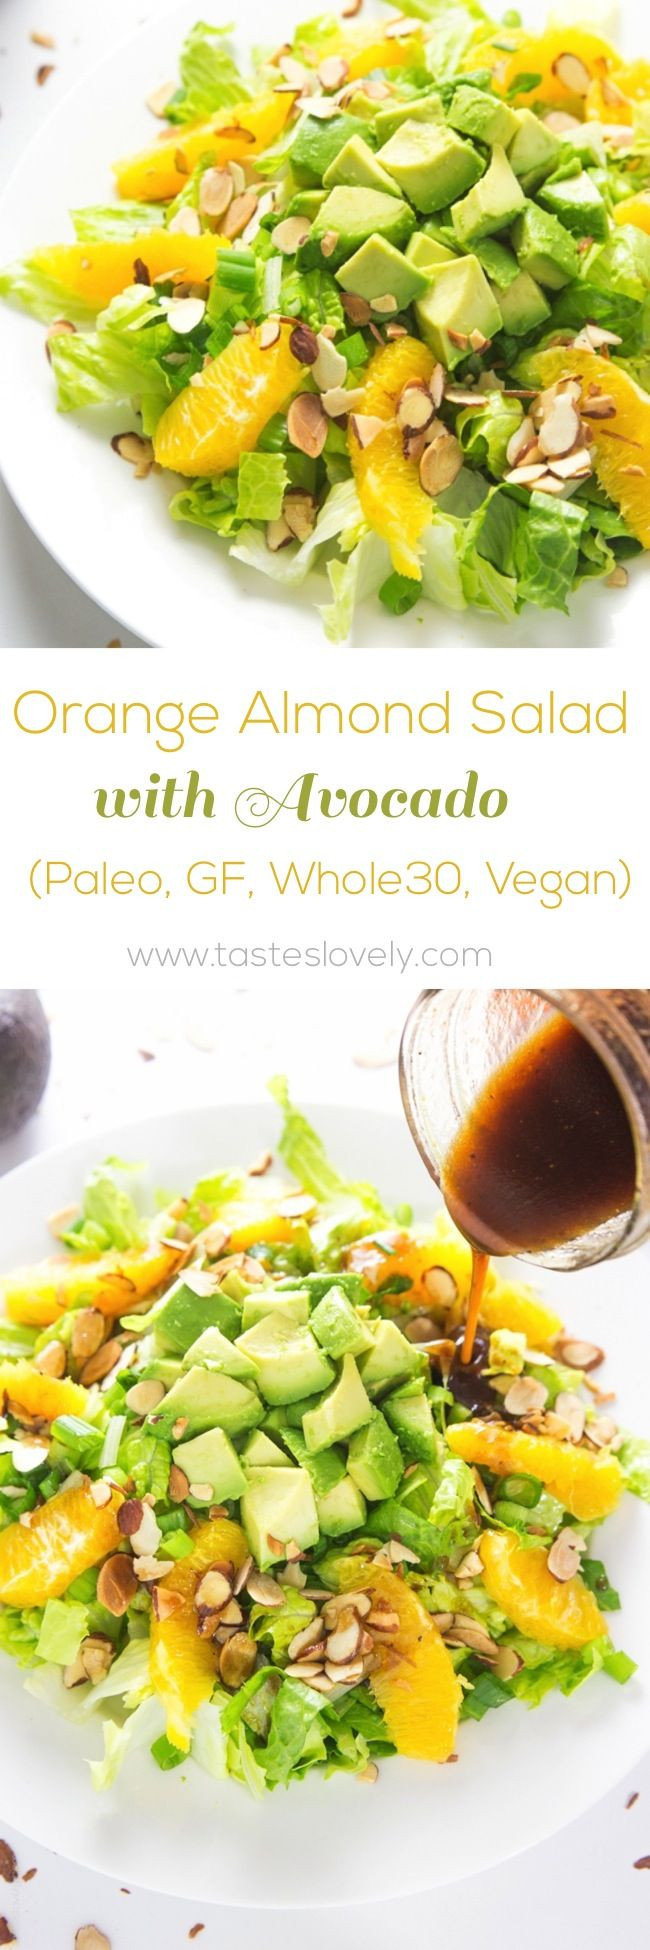 Orange Almond Salad with Avocado - my favorite lunch salad! #paleo #glutenfree #whole30 #vegan